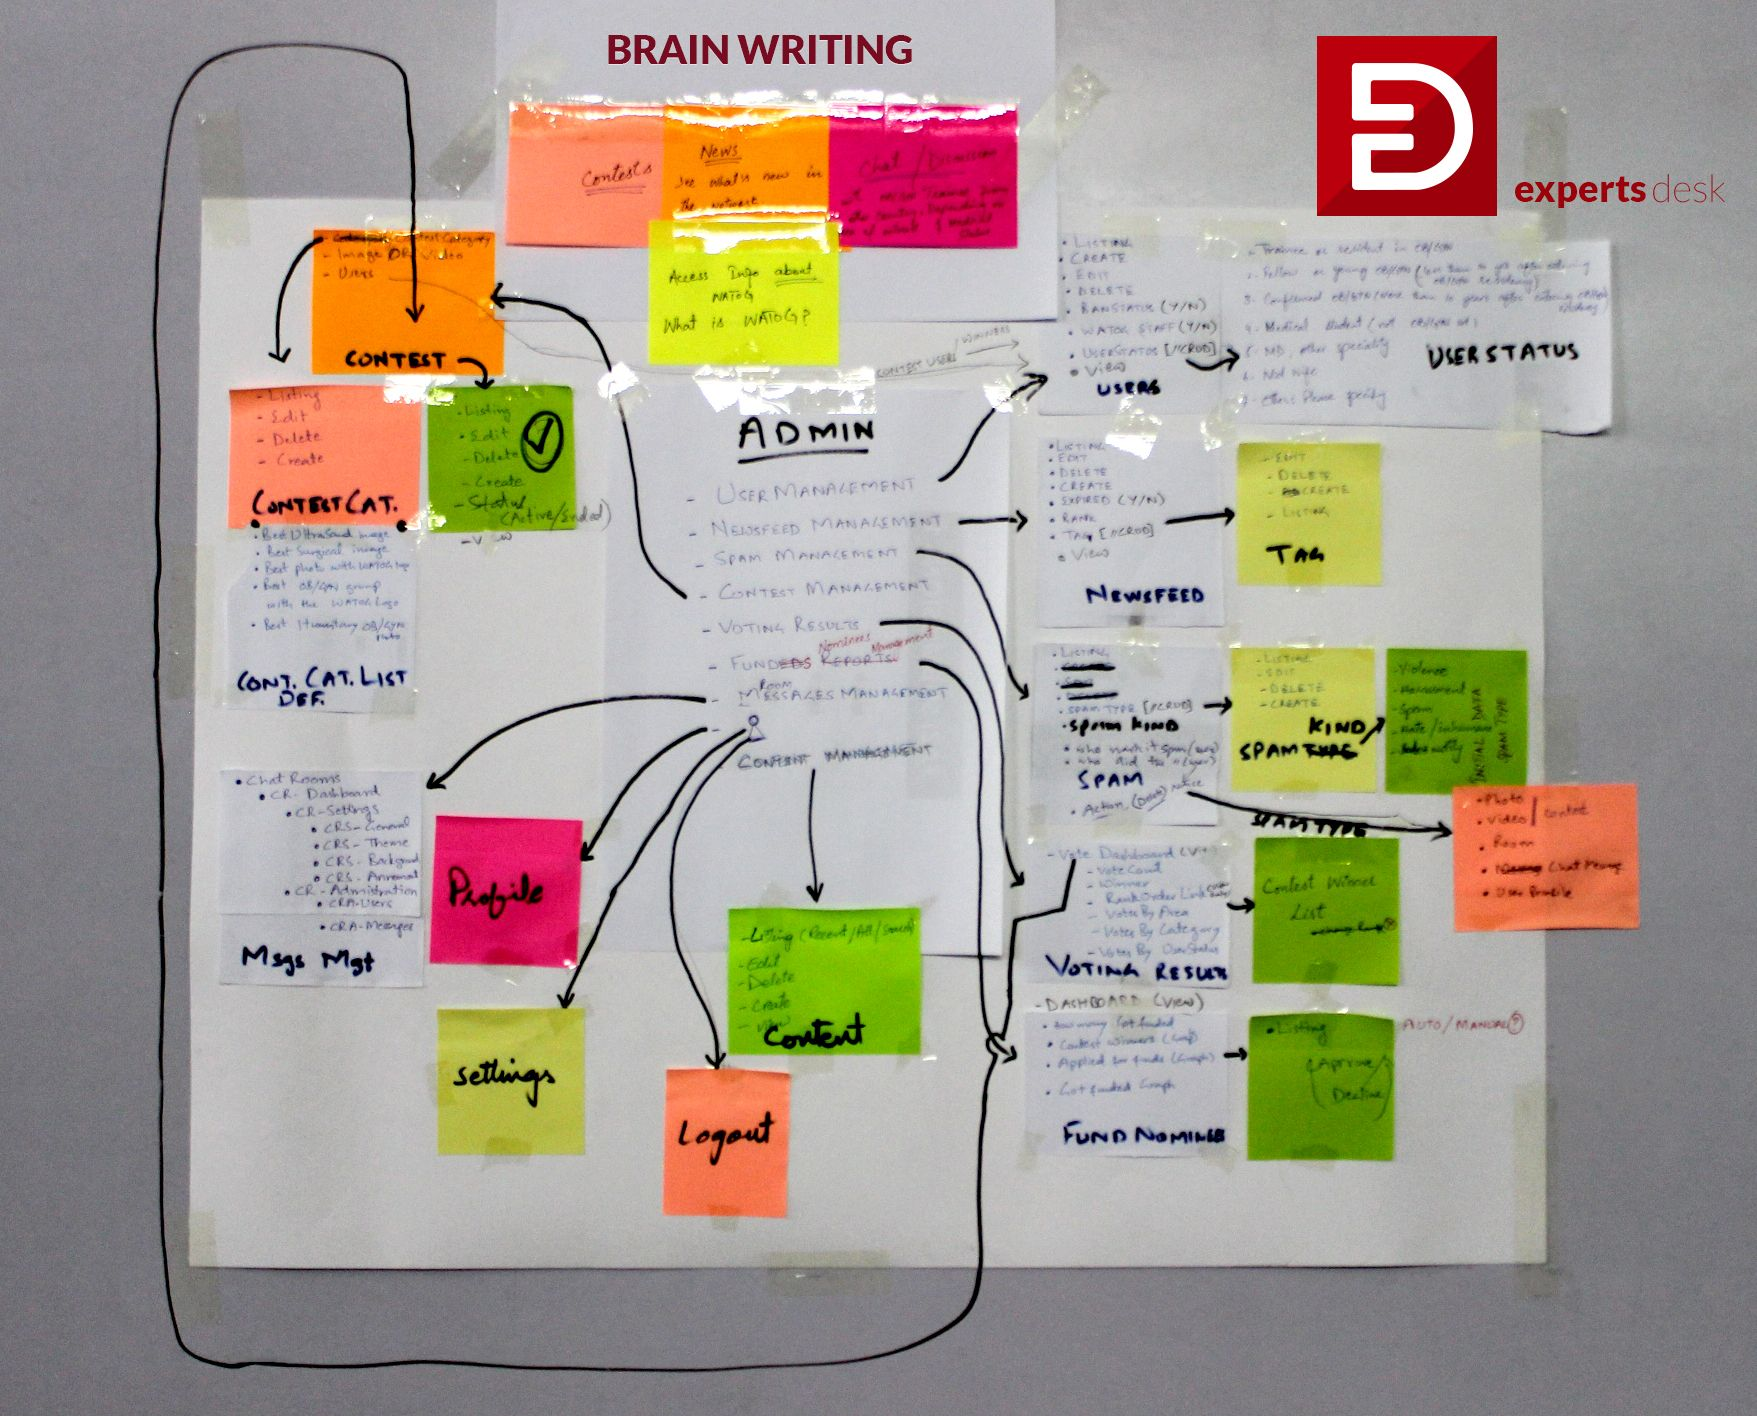 Web App User Experience In Process Brainwriting To Make